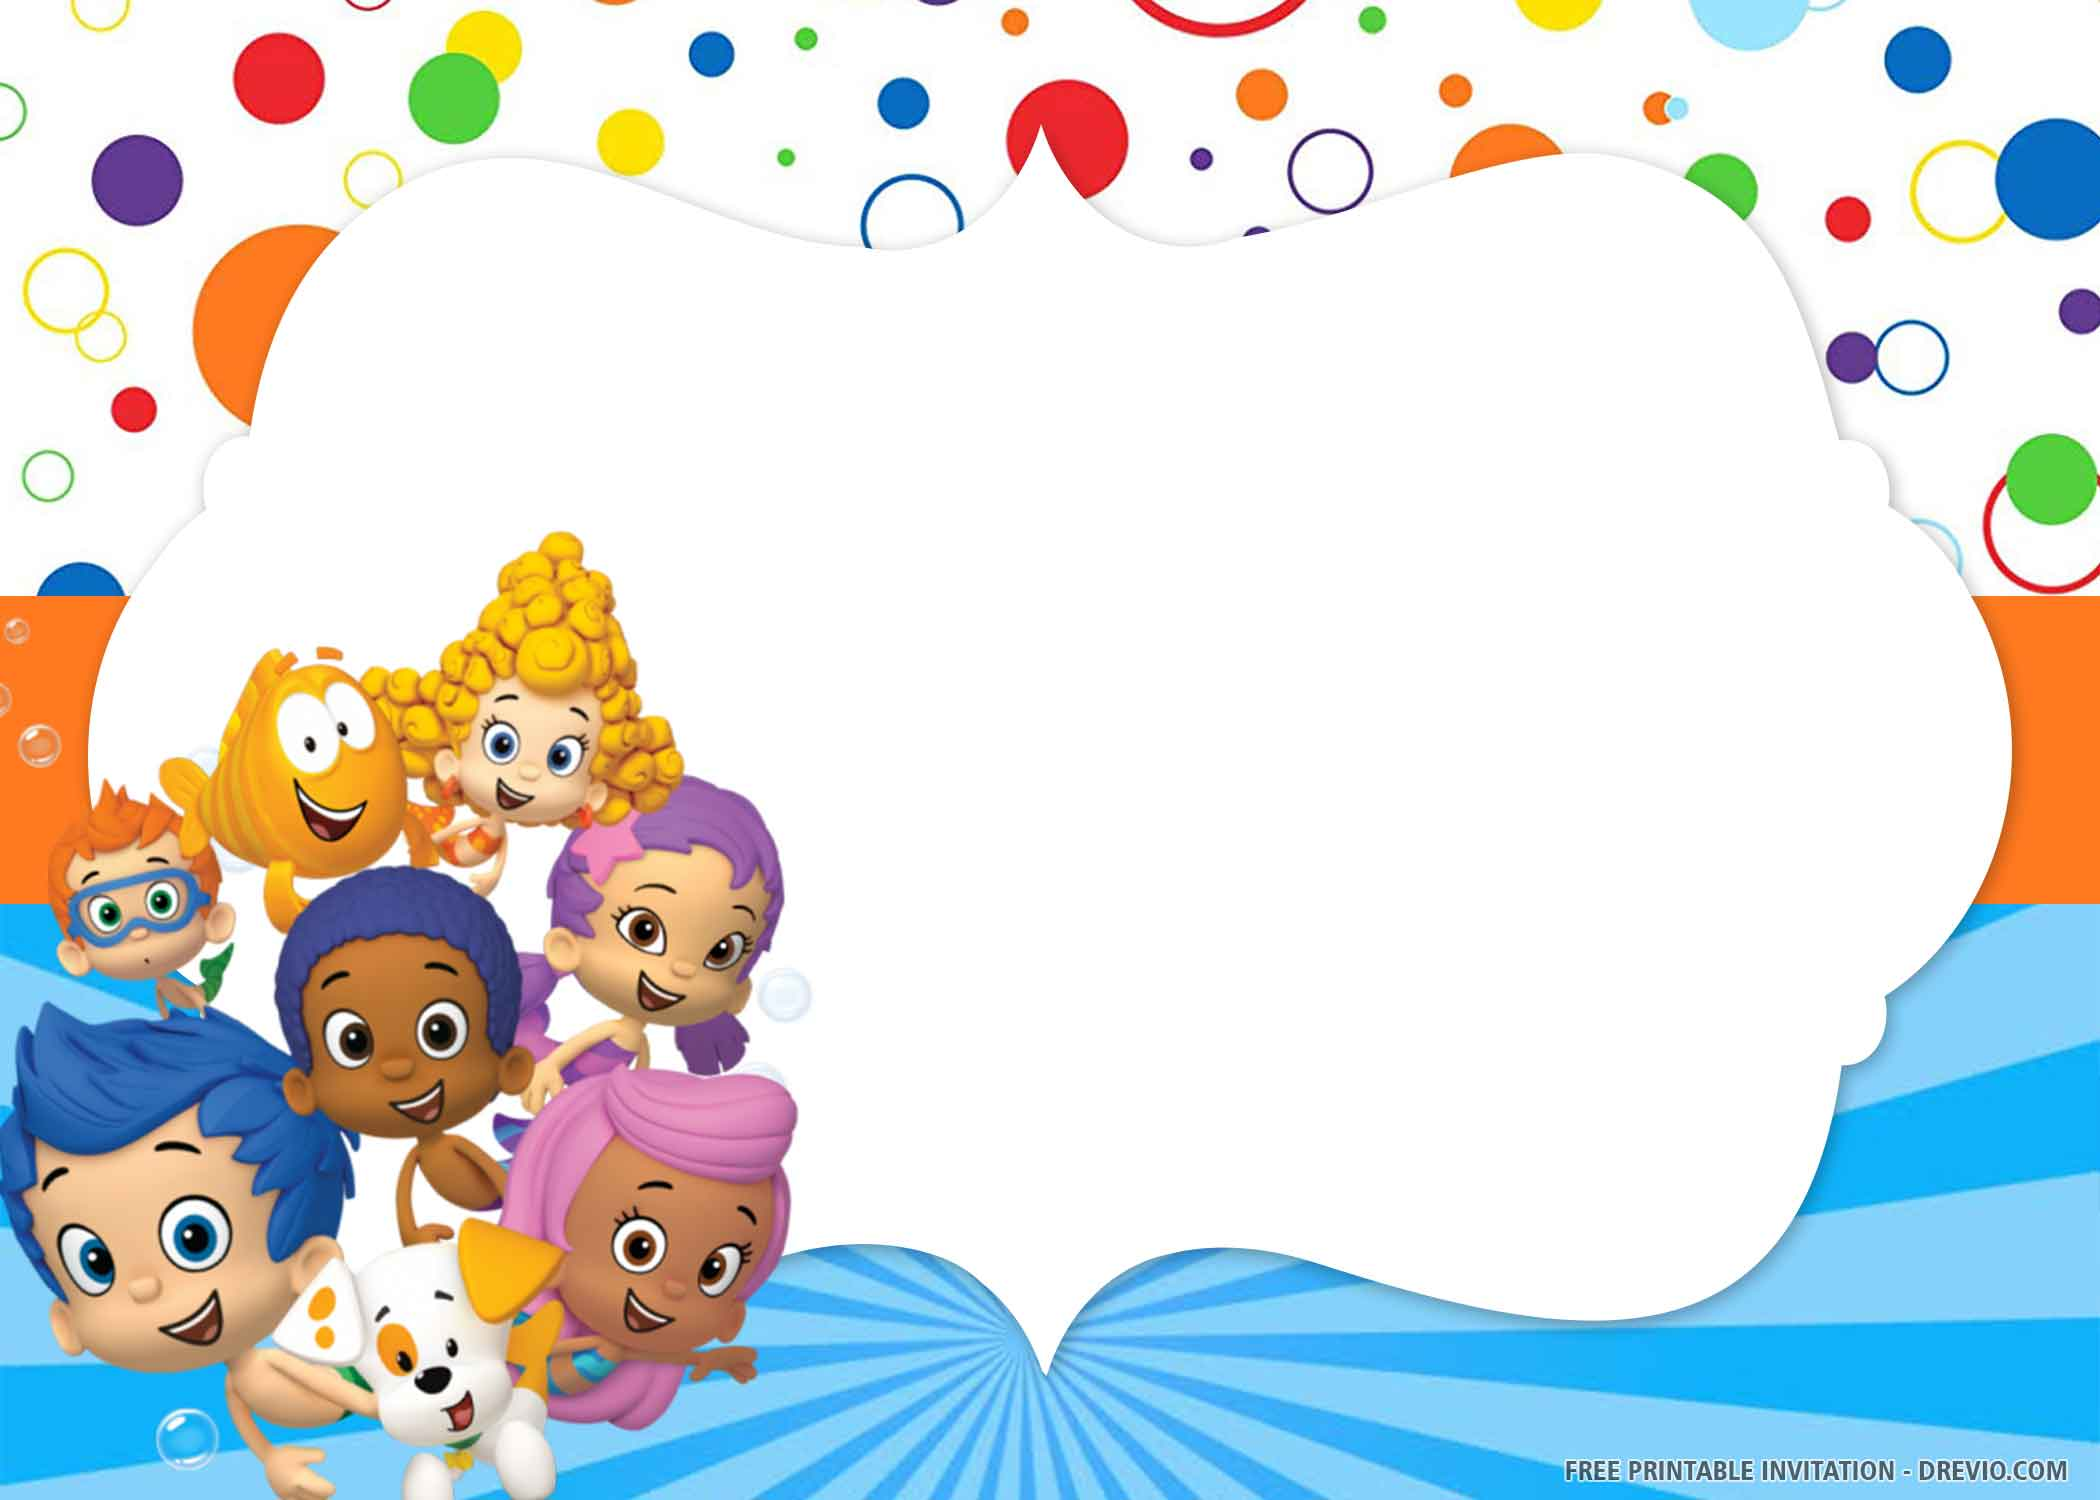 Free Printable Bubble Guppies Birthday Invitation